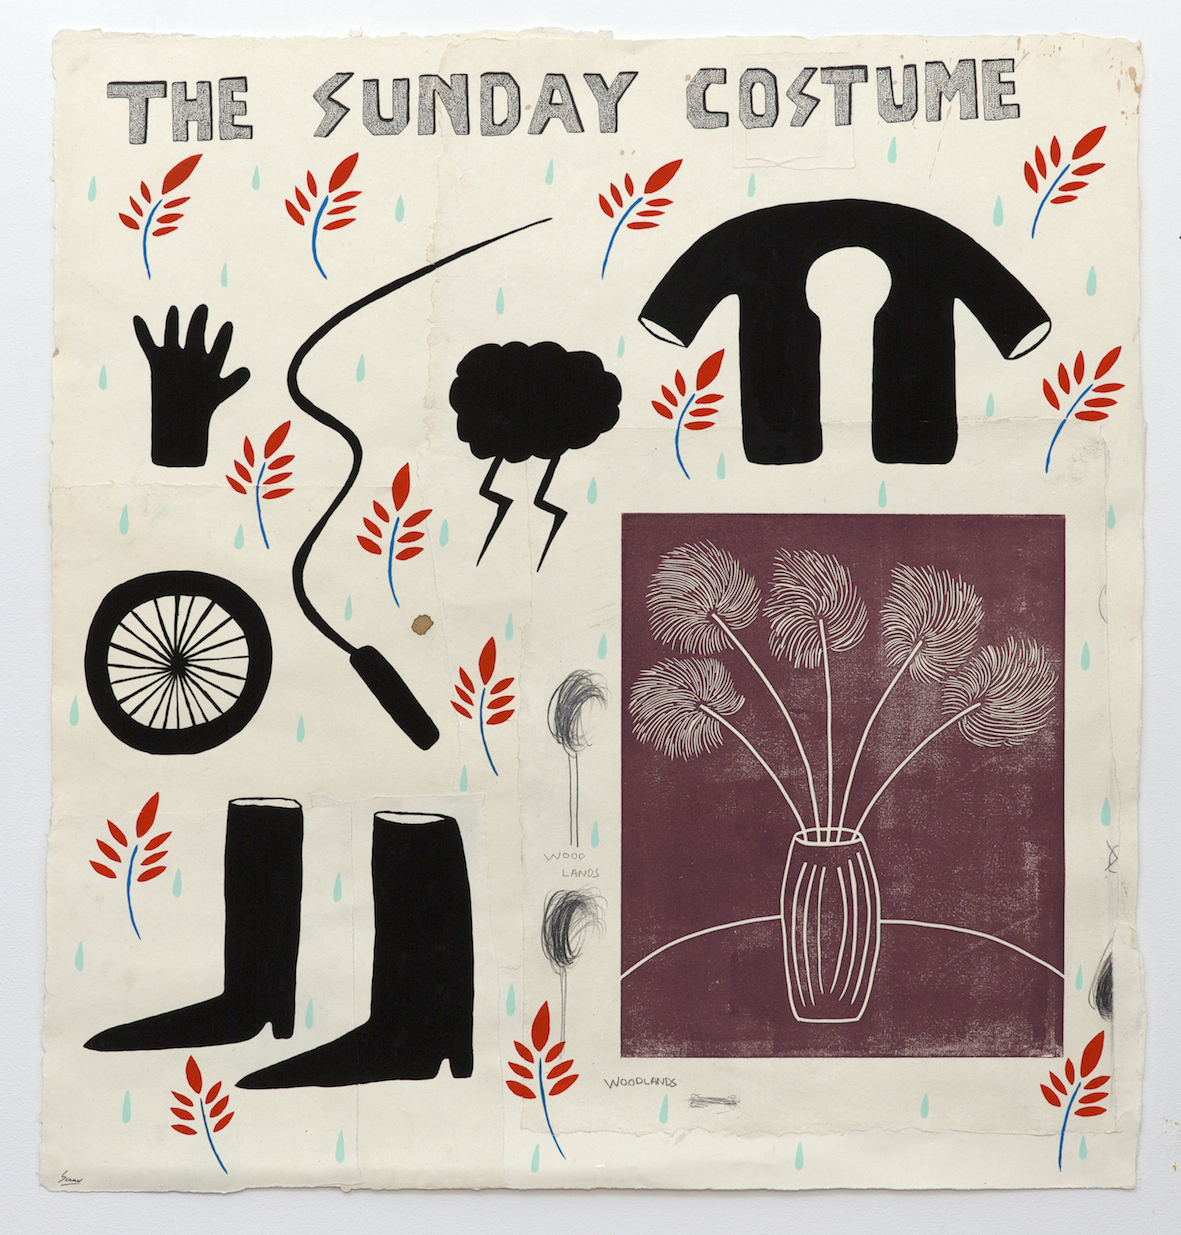 The Sunday Costume